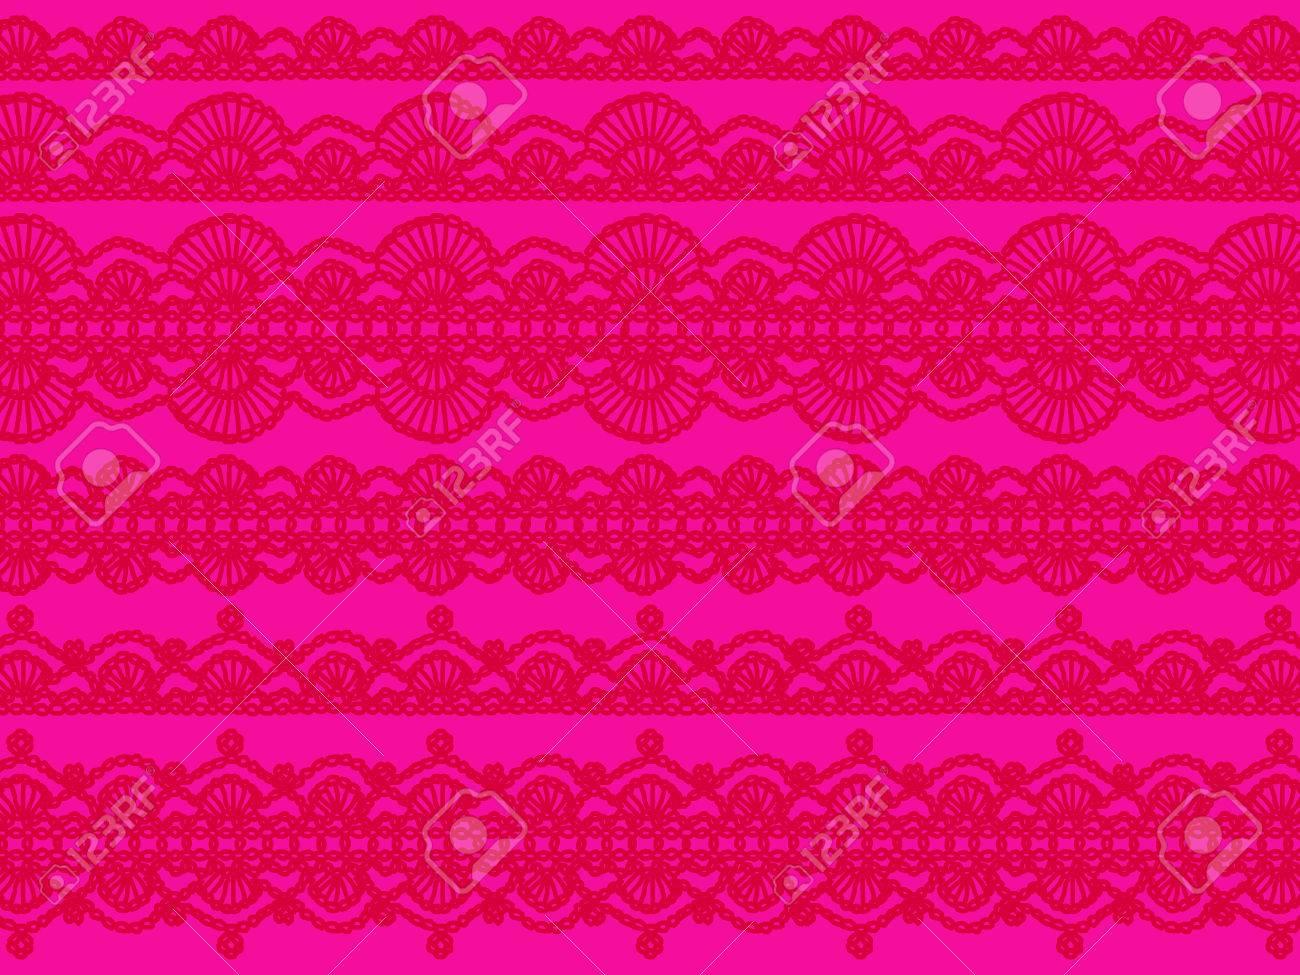 Brilliant Rosa Hintergrund Mit Roten Häkeln Feminine Muster ...